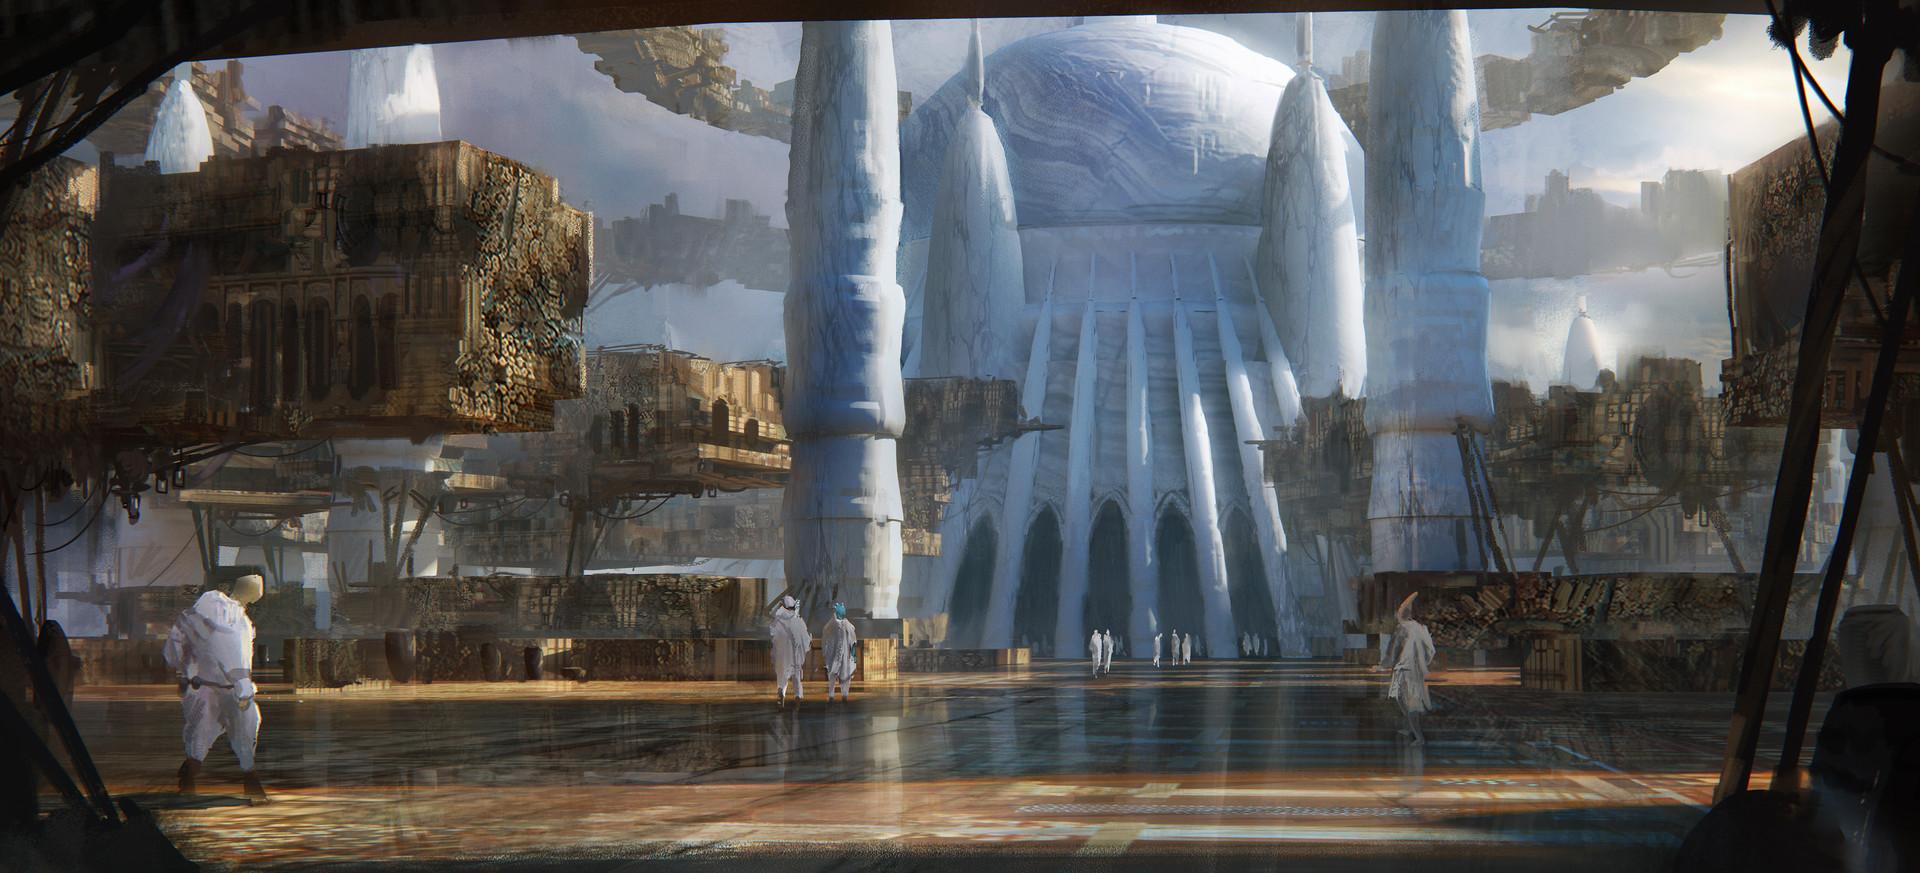 The Sci Fi Art Of Leon Tukker Science Fiction Artist